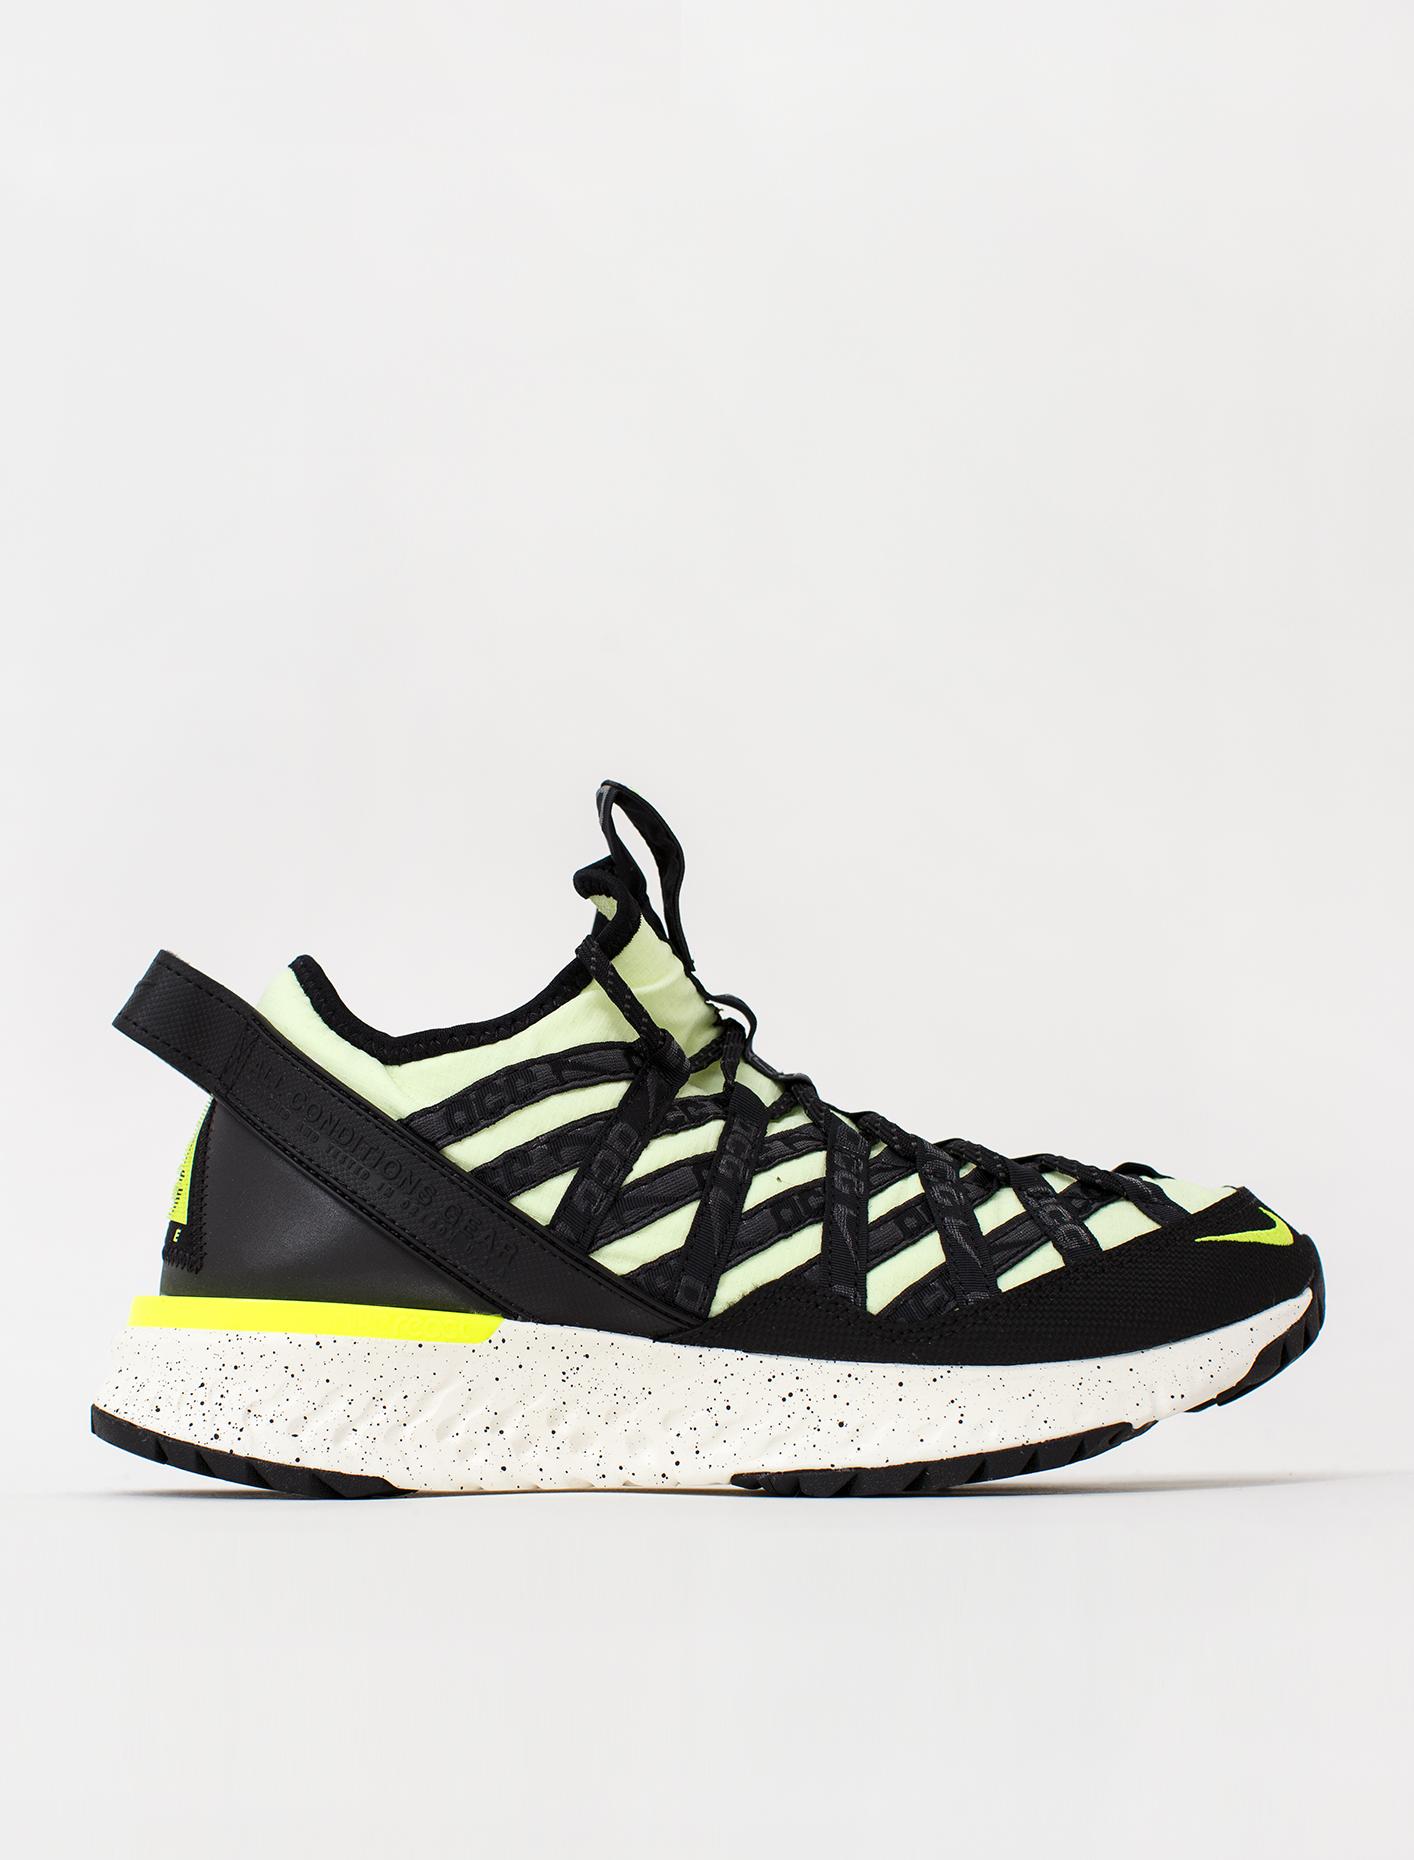 Nike ACG React Terra Gobe Sneaker | Voo